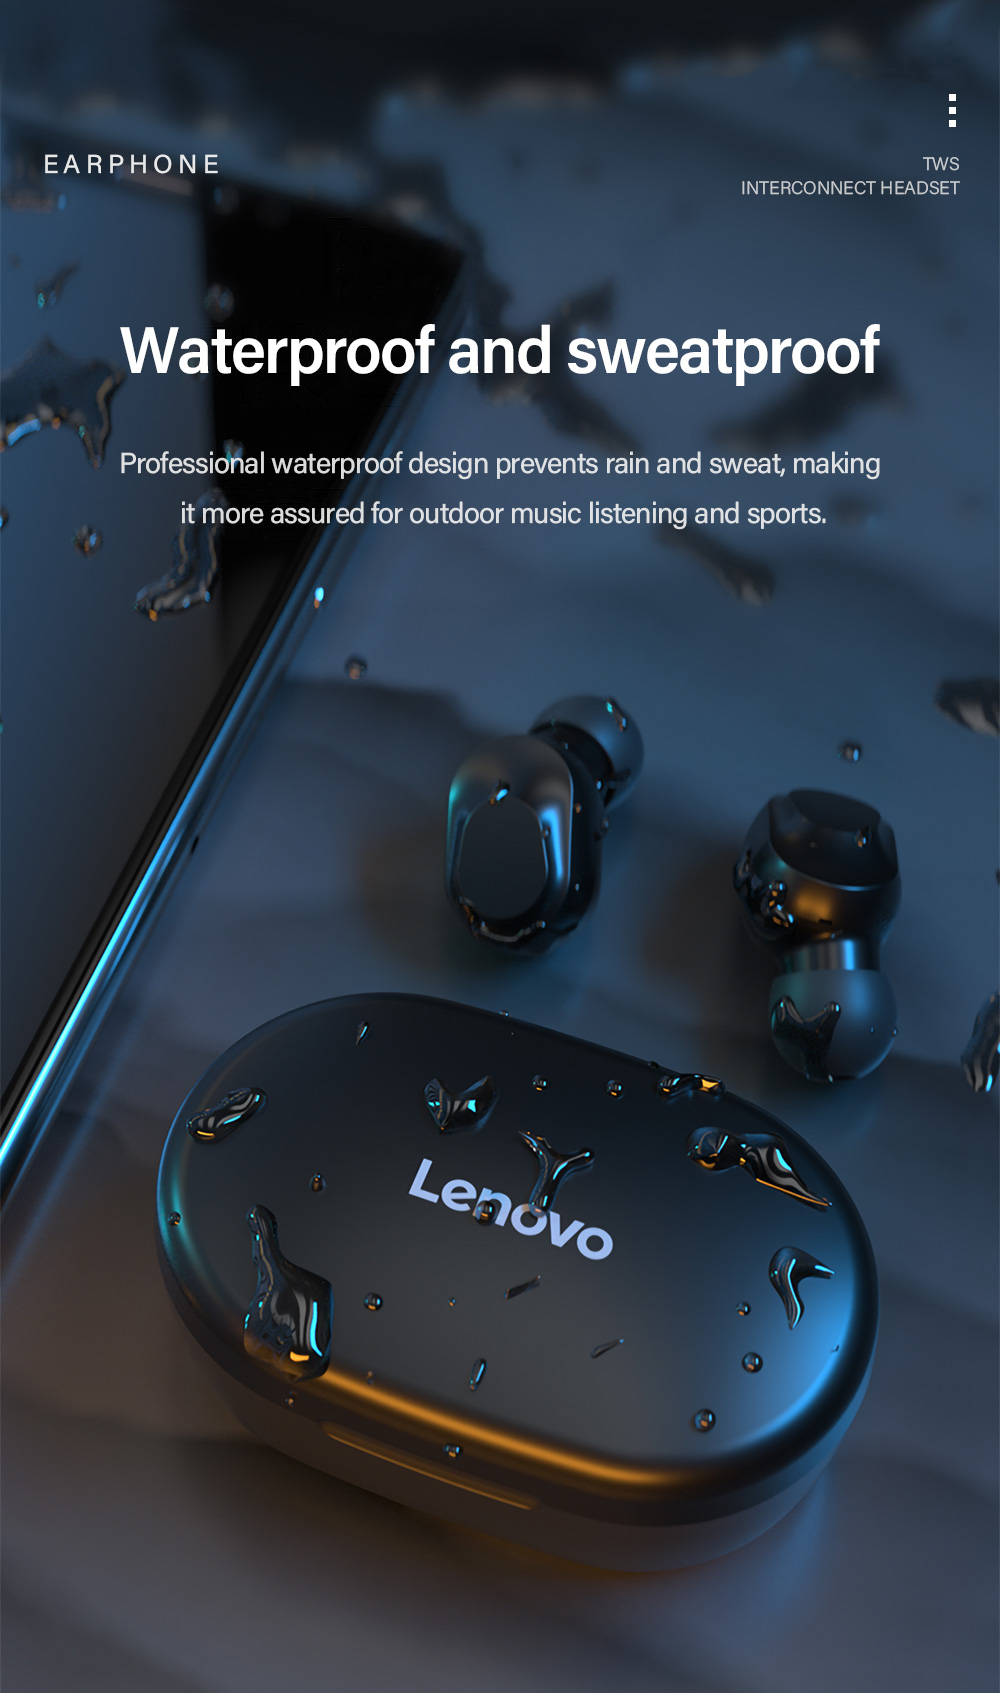 Lenovo XT91 TWS Earphone 8